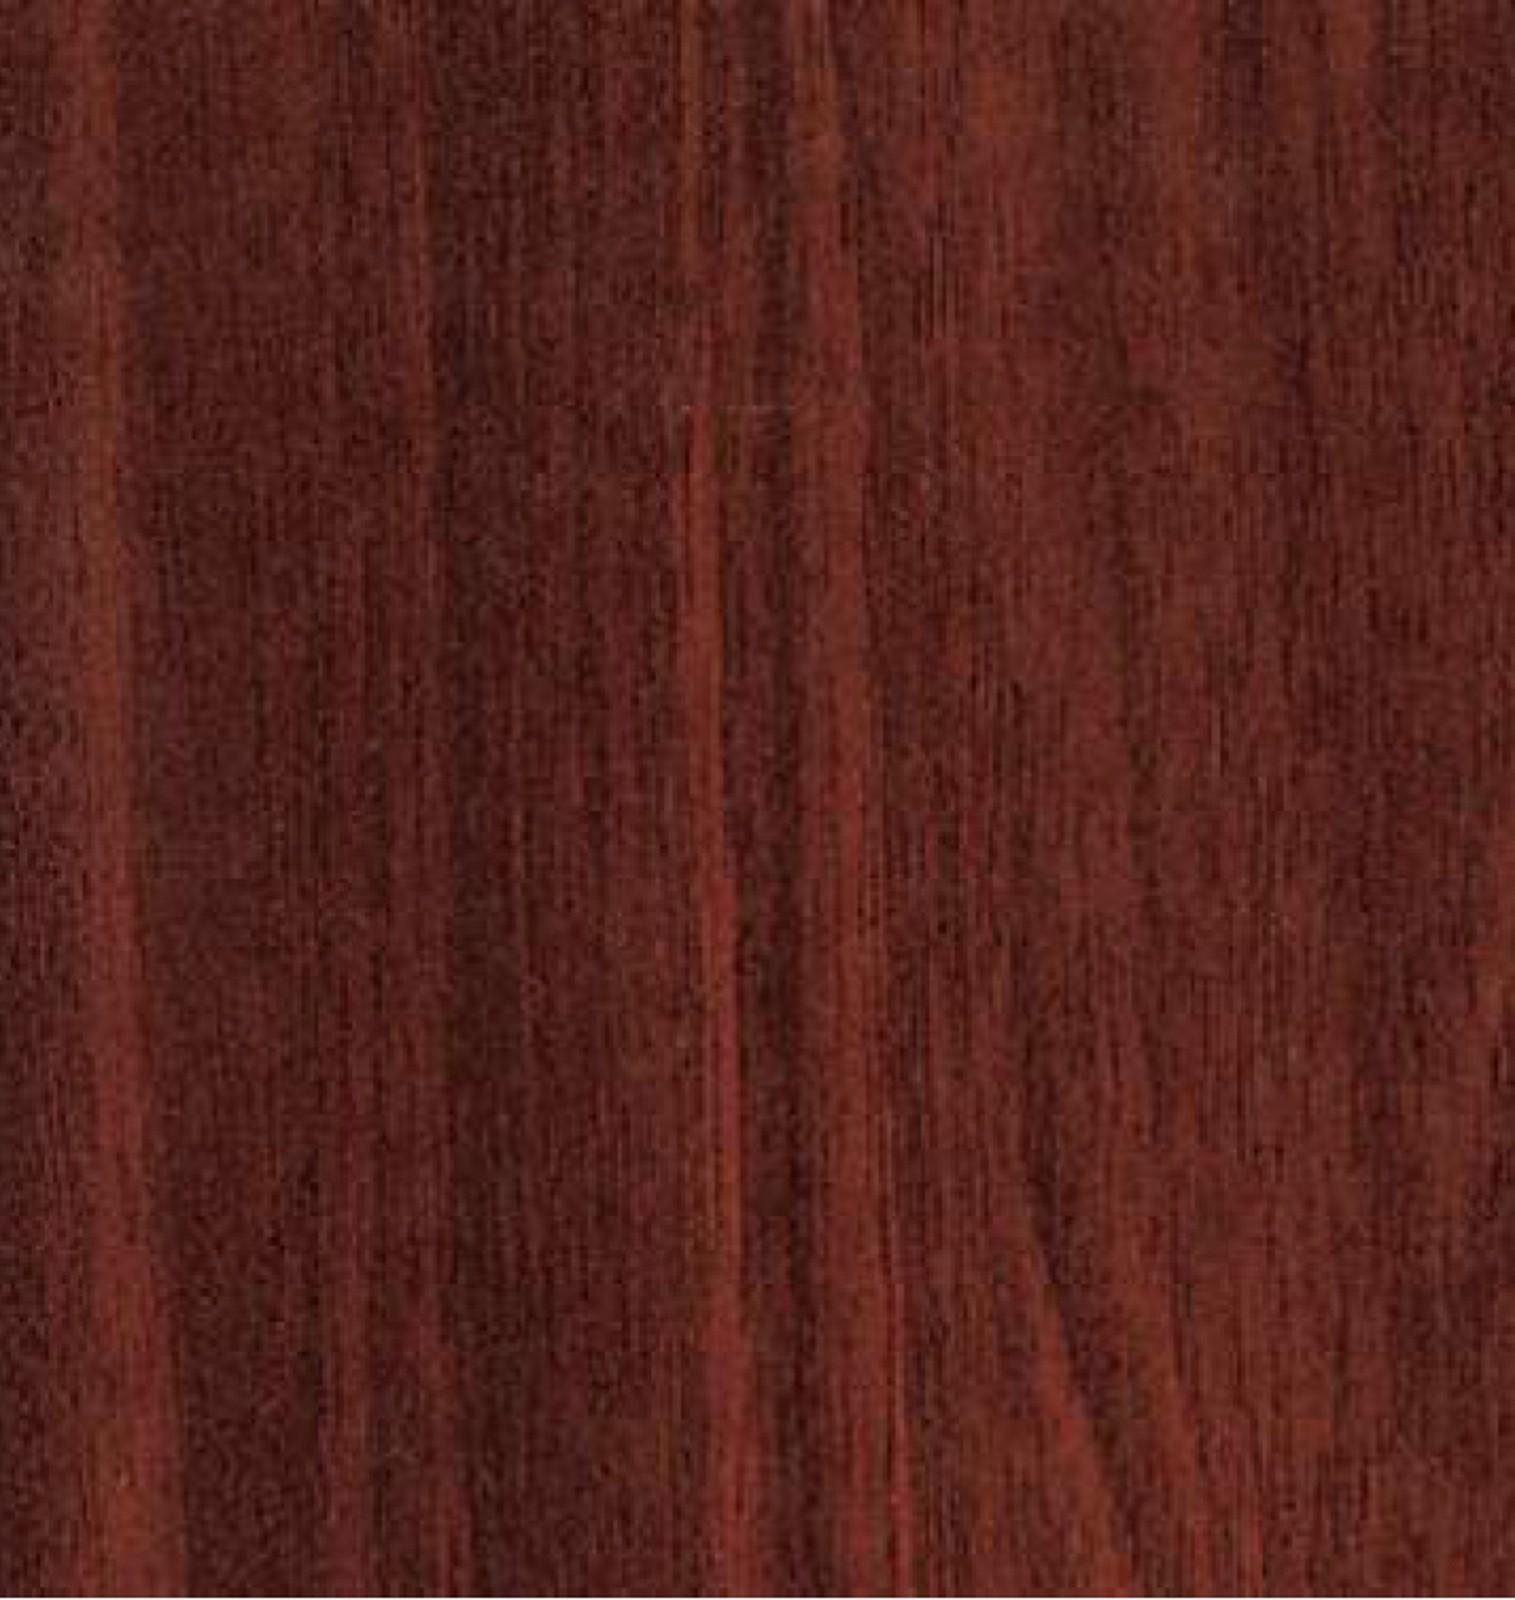 klebefolie holzoptik mahagoni m belfolie dekorfolie 45 x 200 cm klebefolie holzoptik. Black Bedroom Furniture Sets. Home Design Ideas